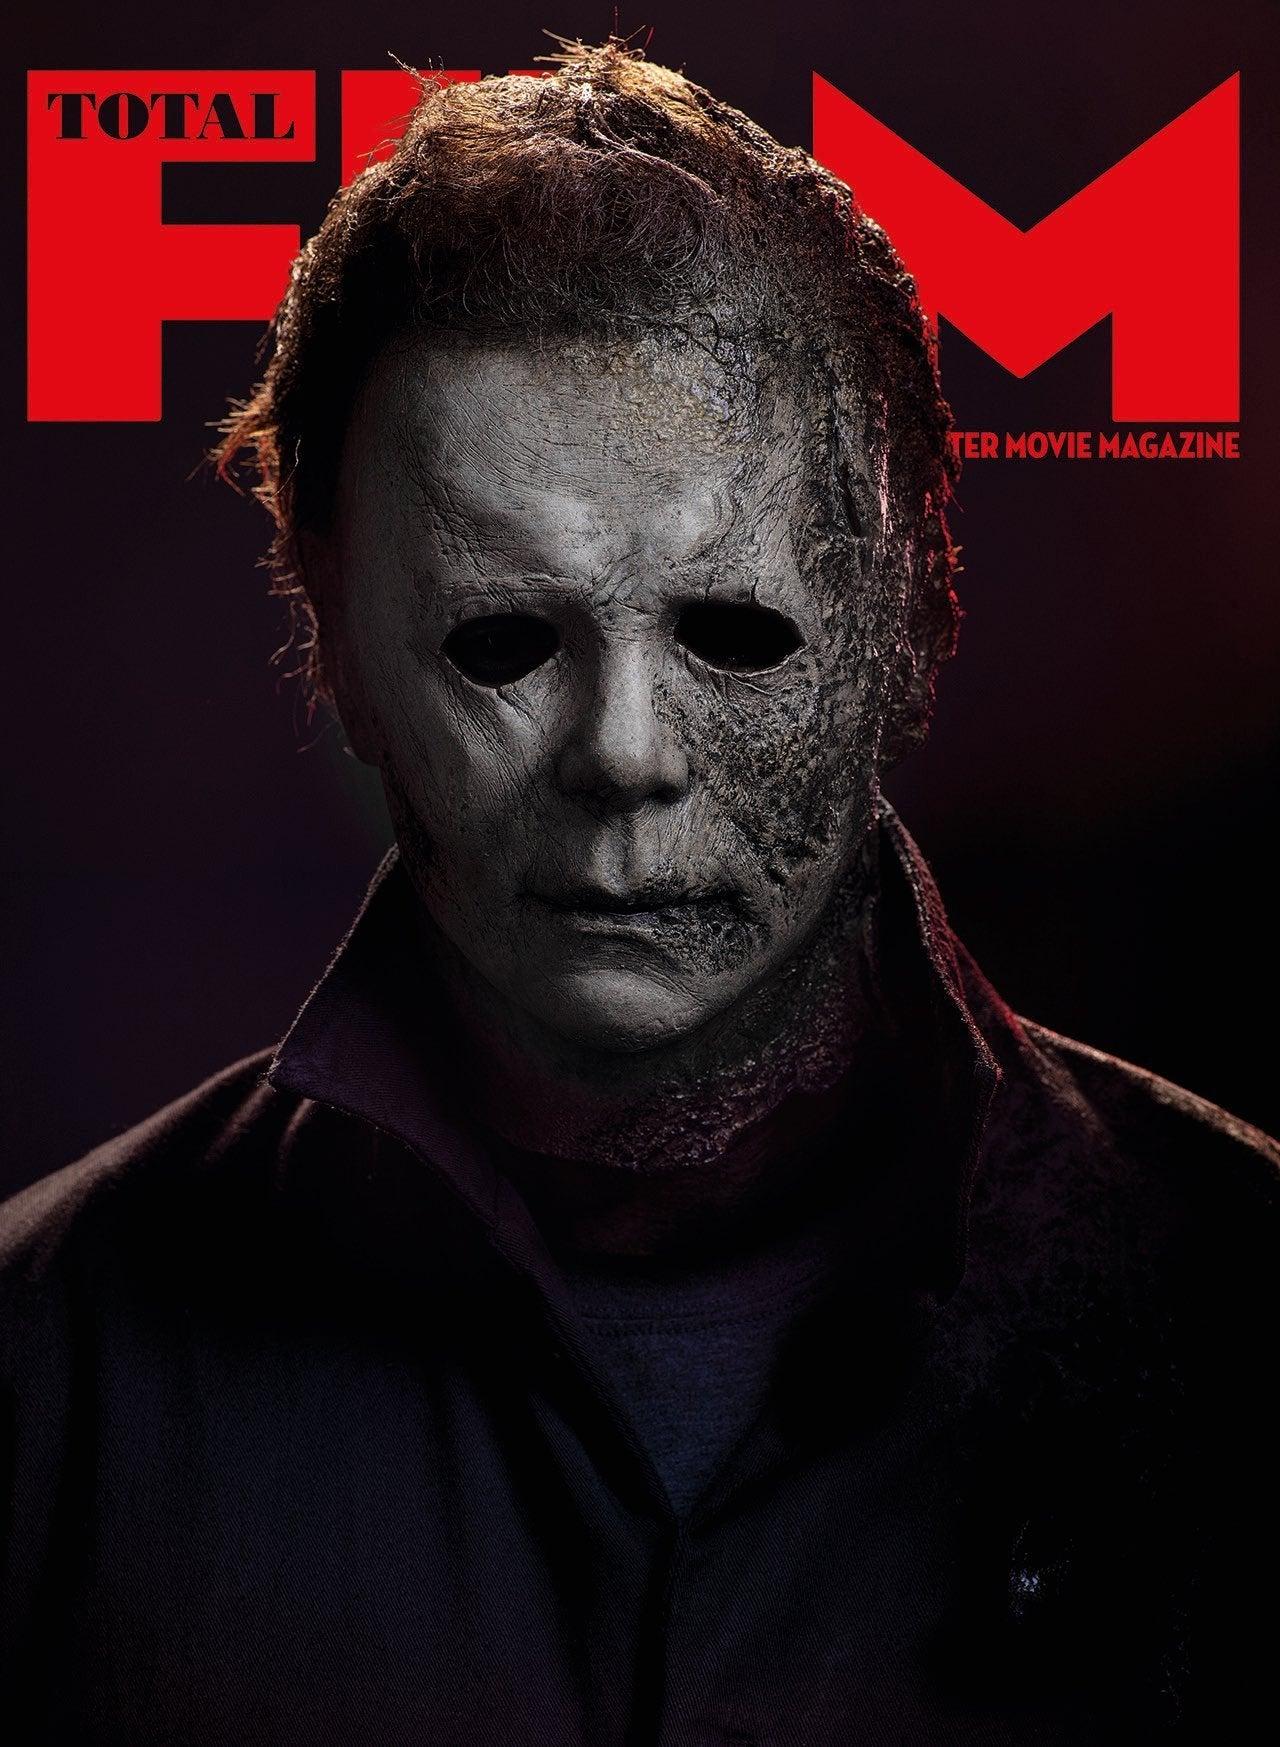 michael myers halloween kills mask total film cover 1